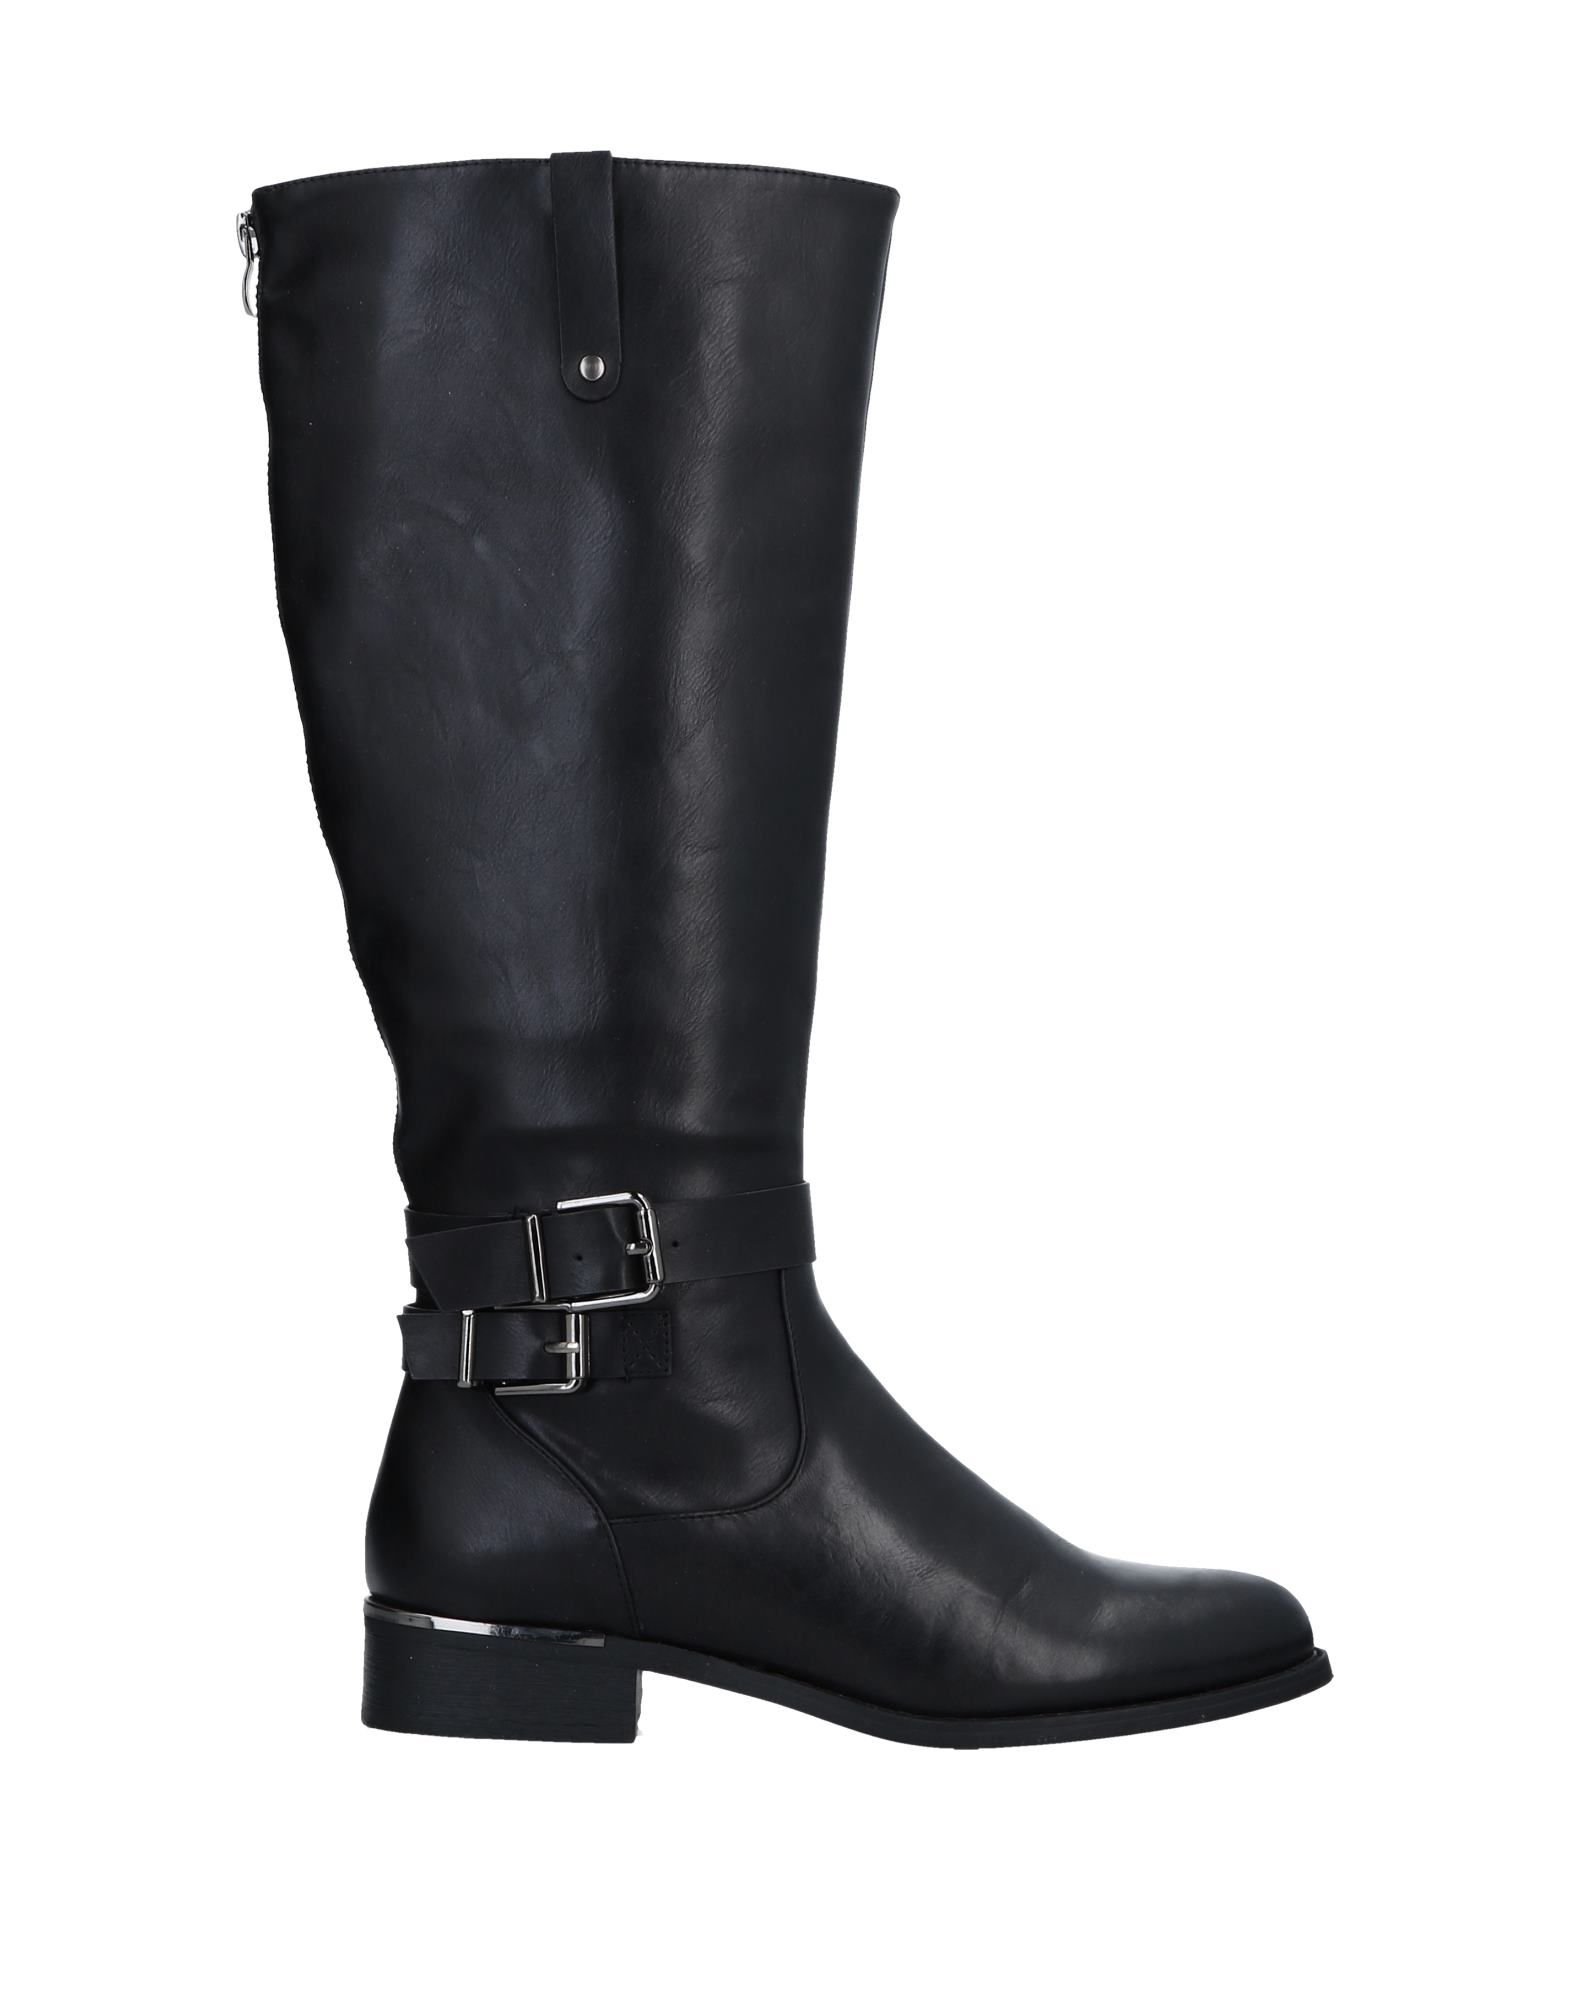 Stivali Primadonna Donna - 11530999HS elegante